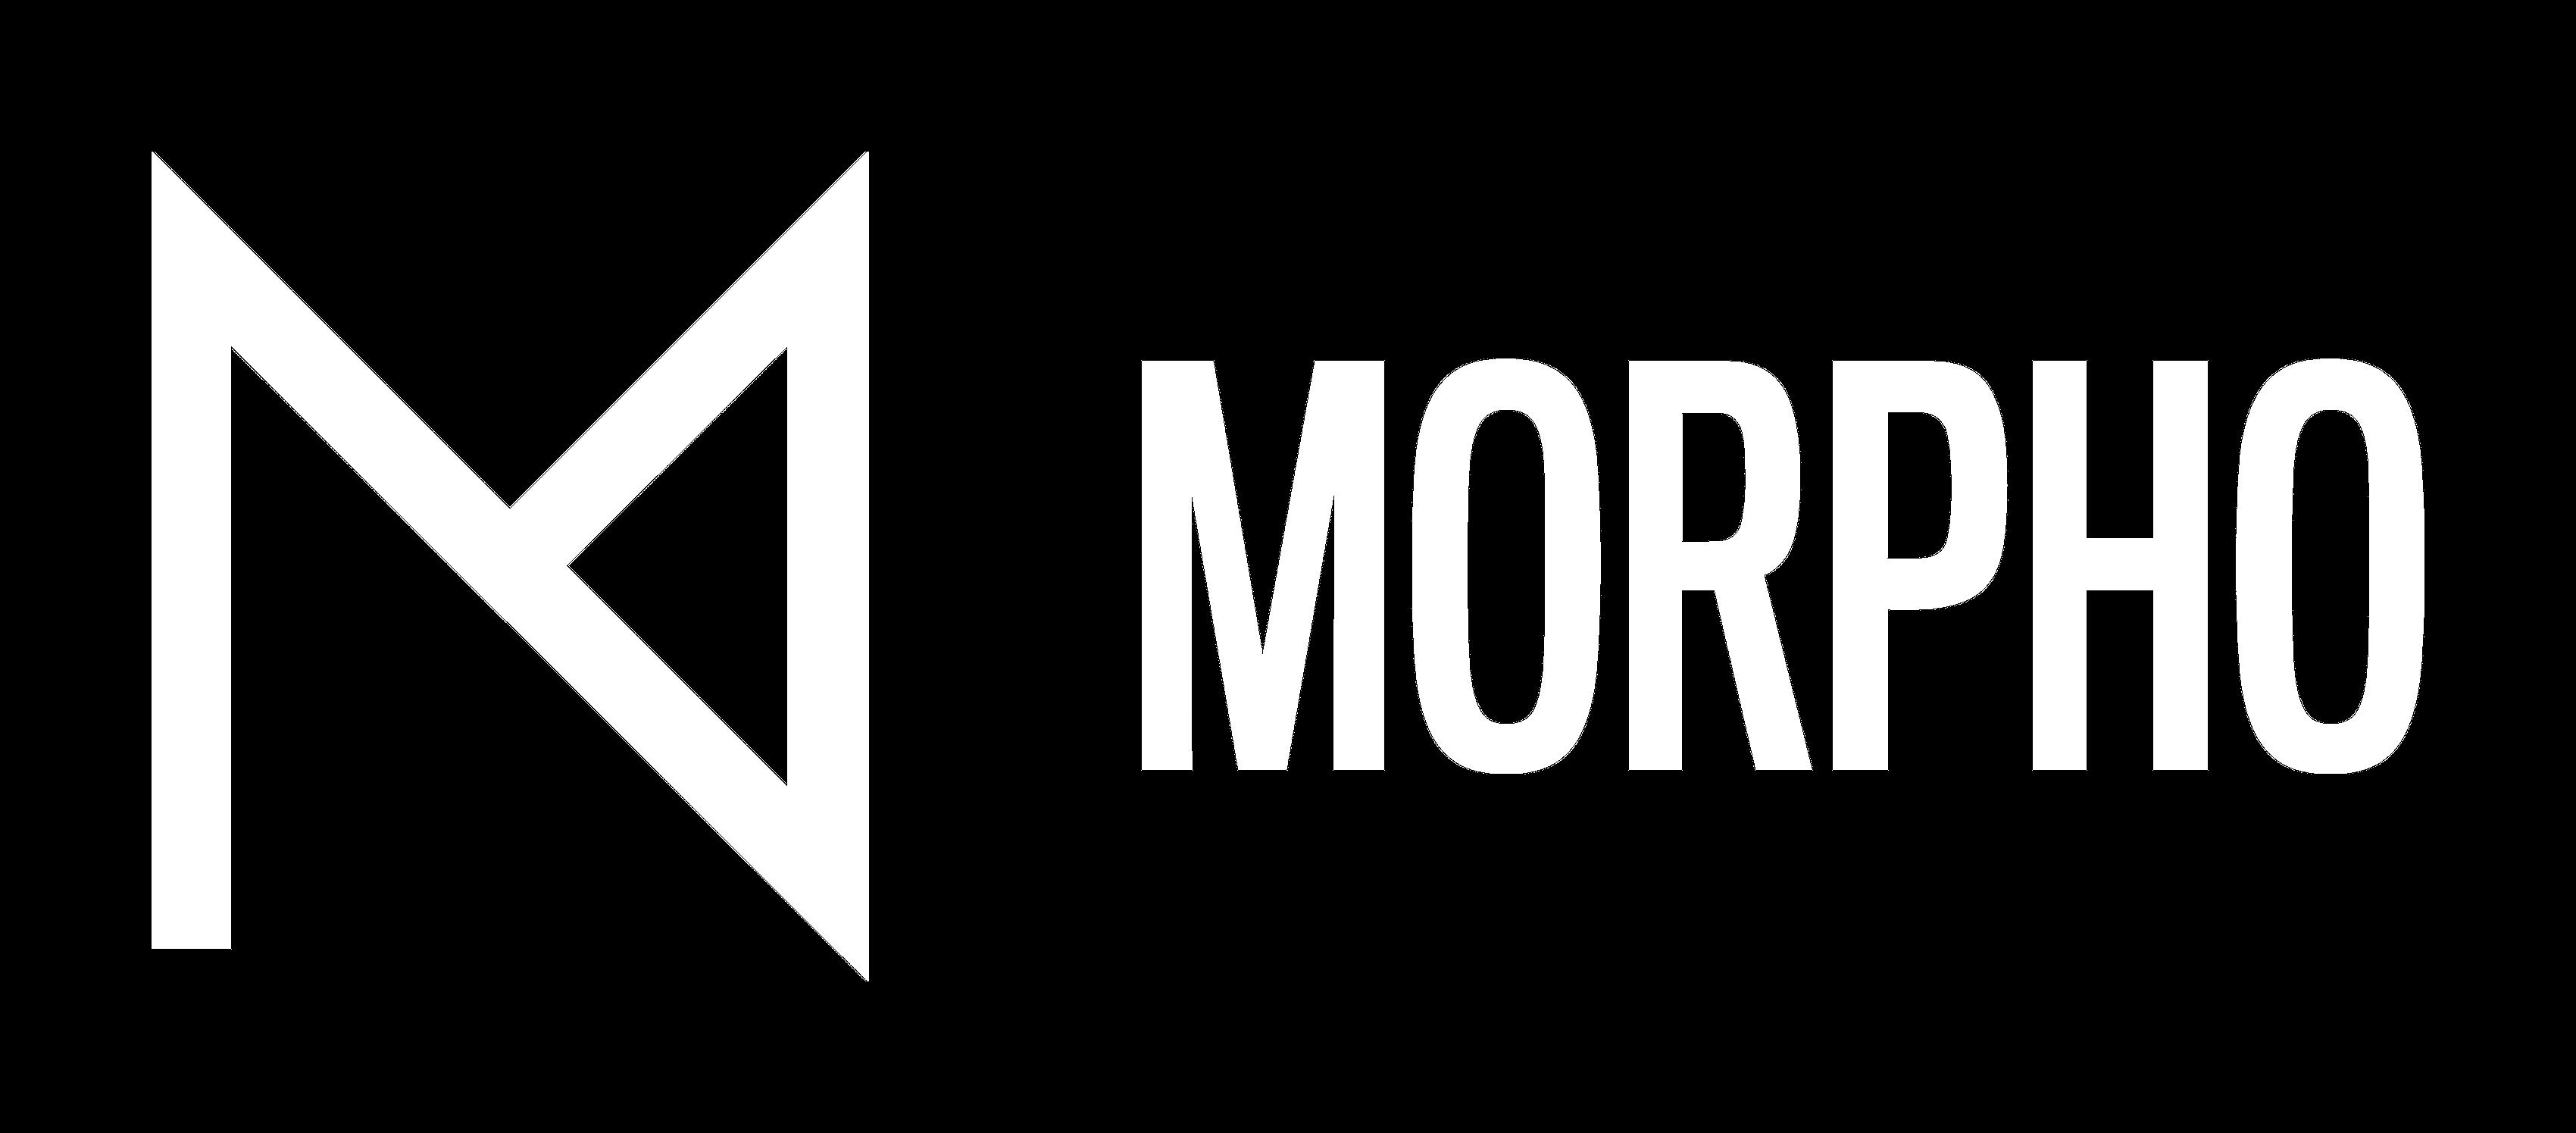 white_logo_transparent_background-1.png